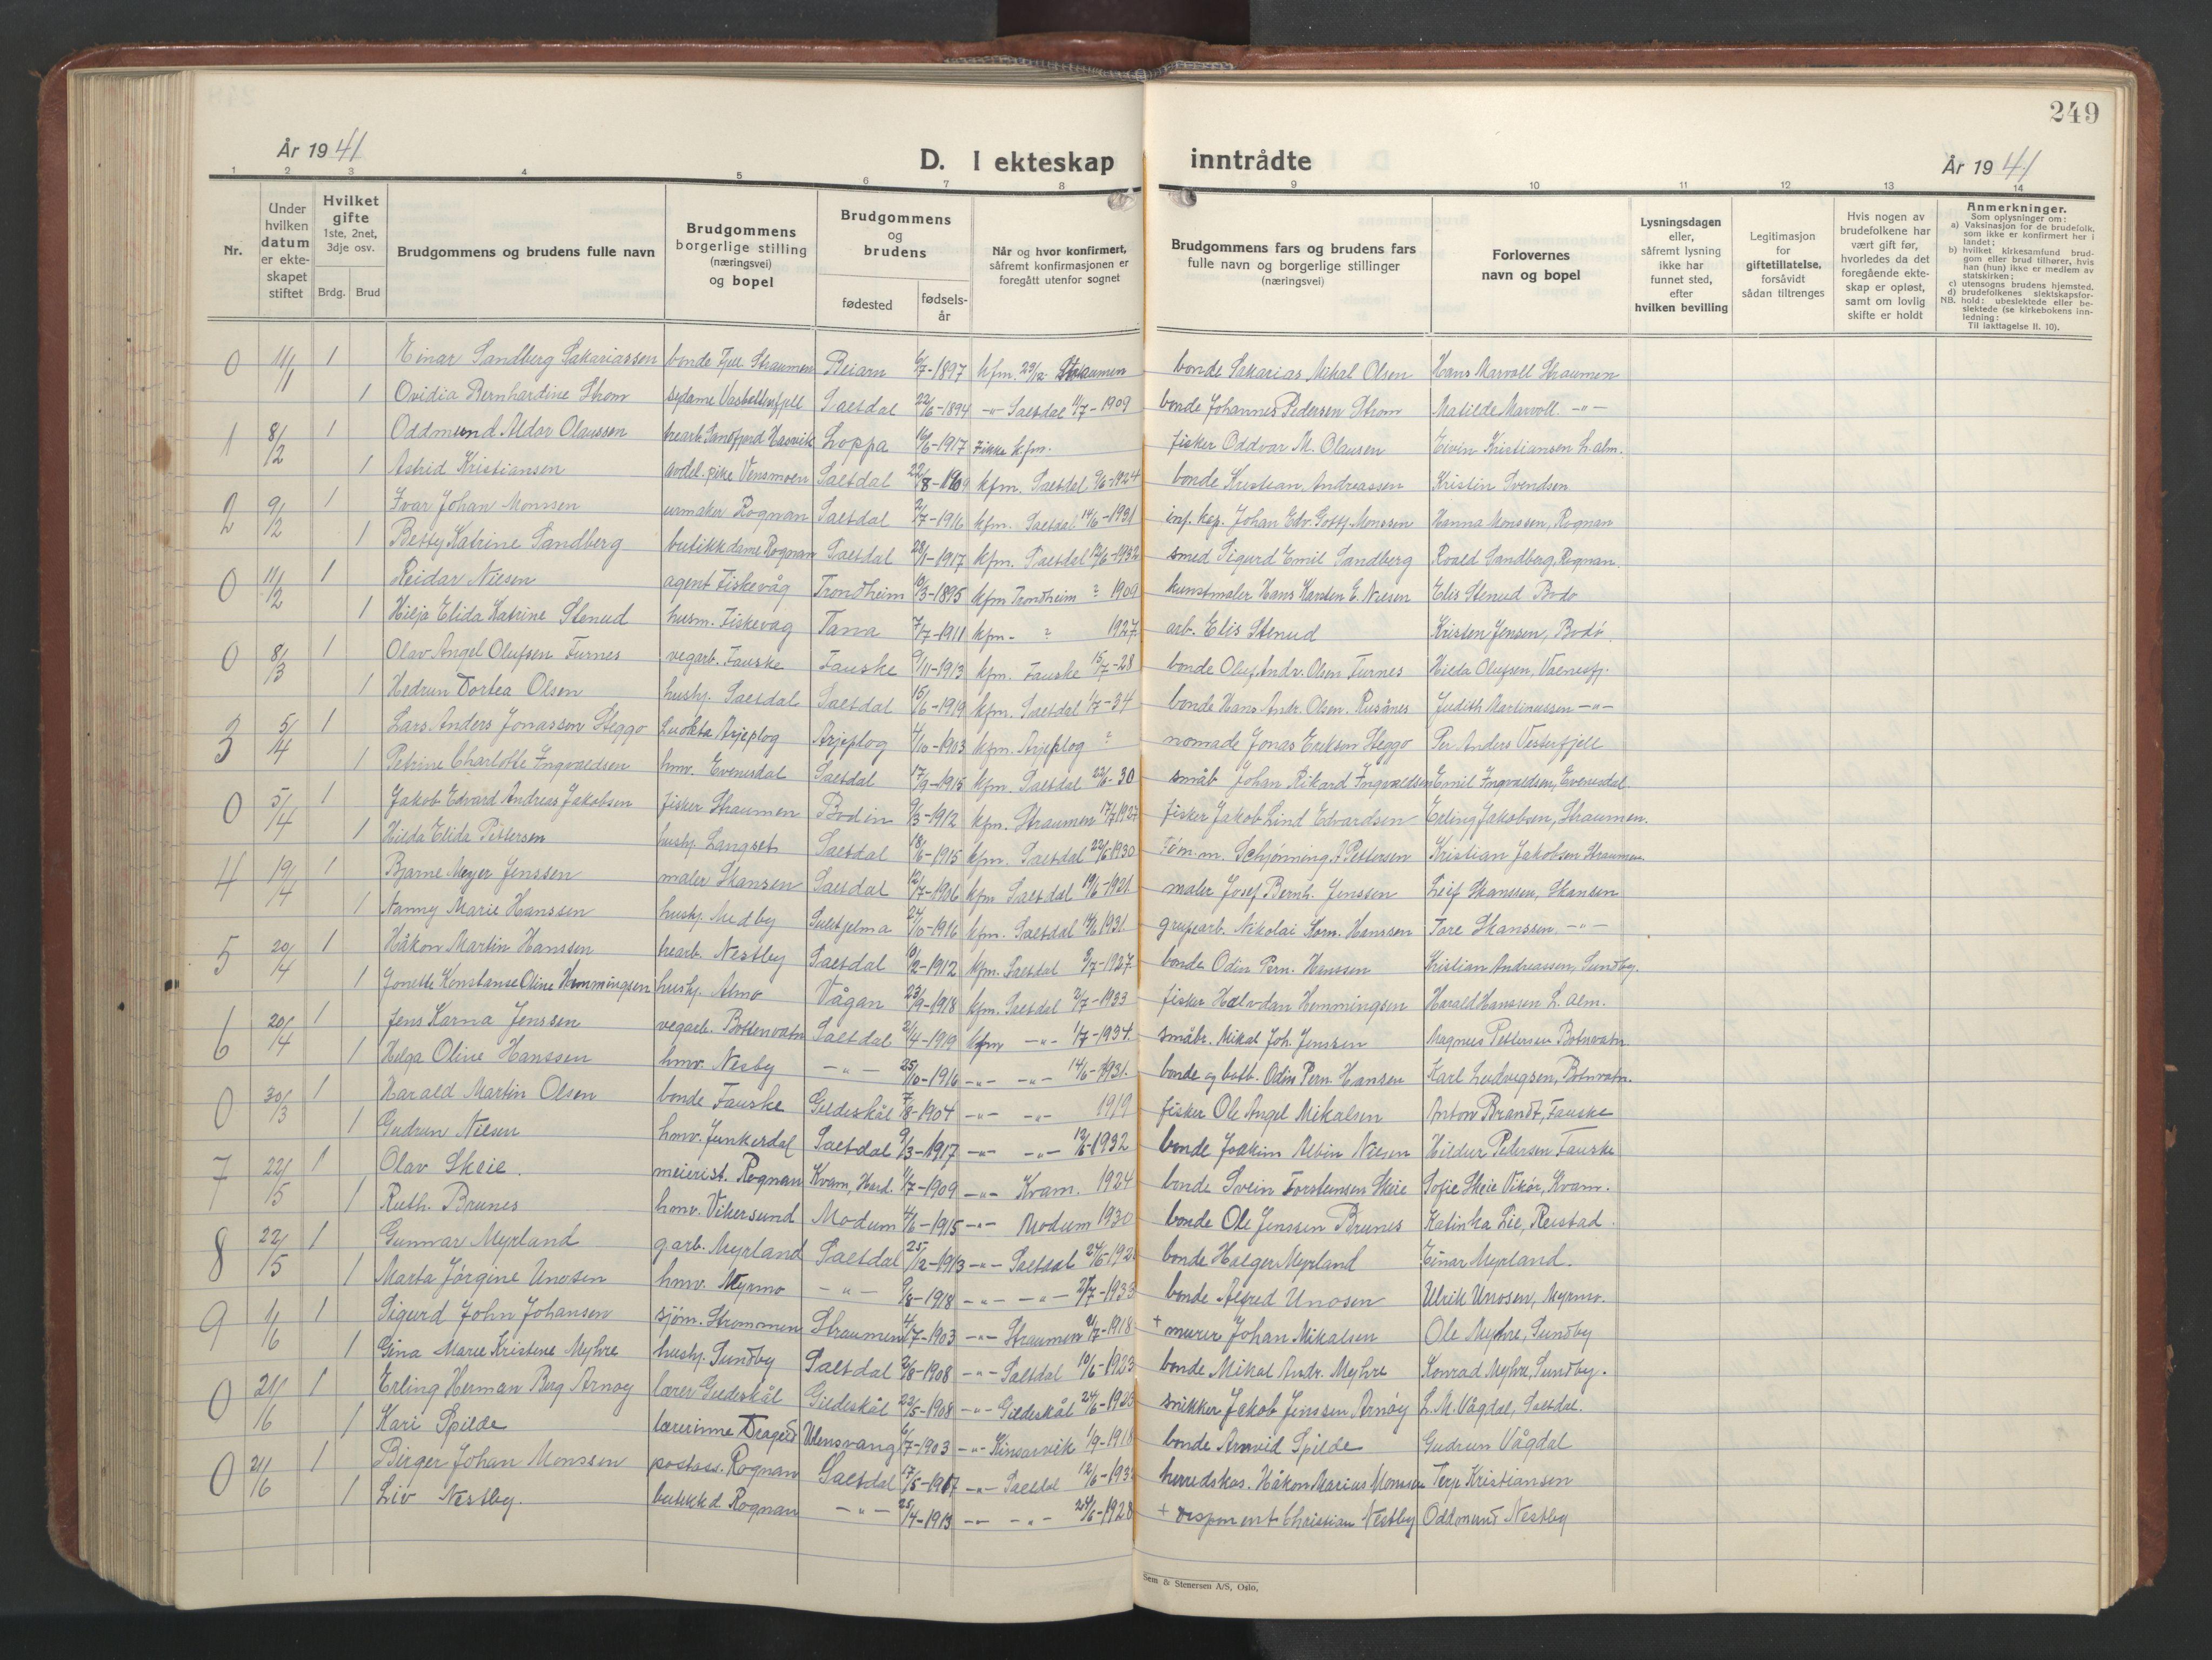 SAT, Ministerialprotokoller, klokkerbøker og fødselsregistre - Nordland, 847/L0680: Klokkerbok nr. 847C08, 1930-1947, s. 249